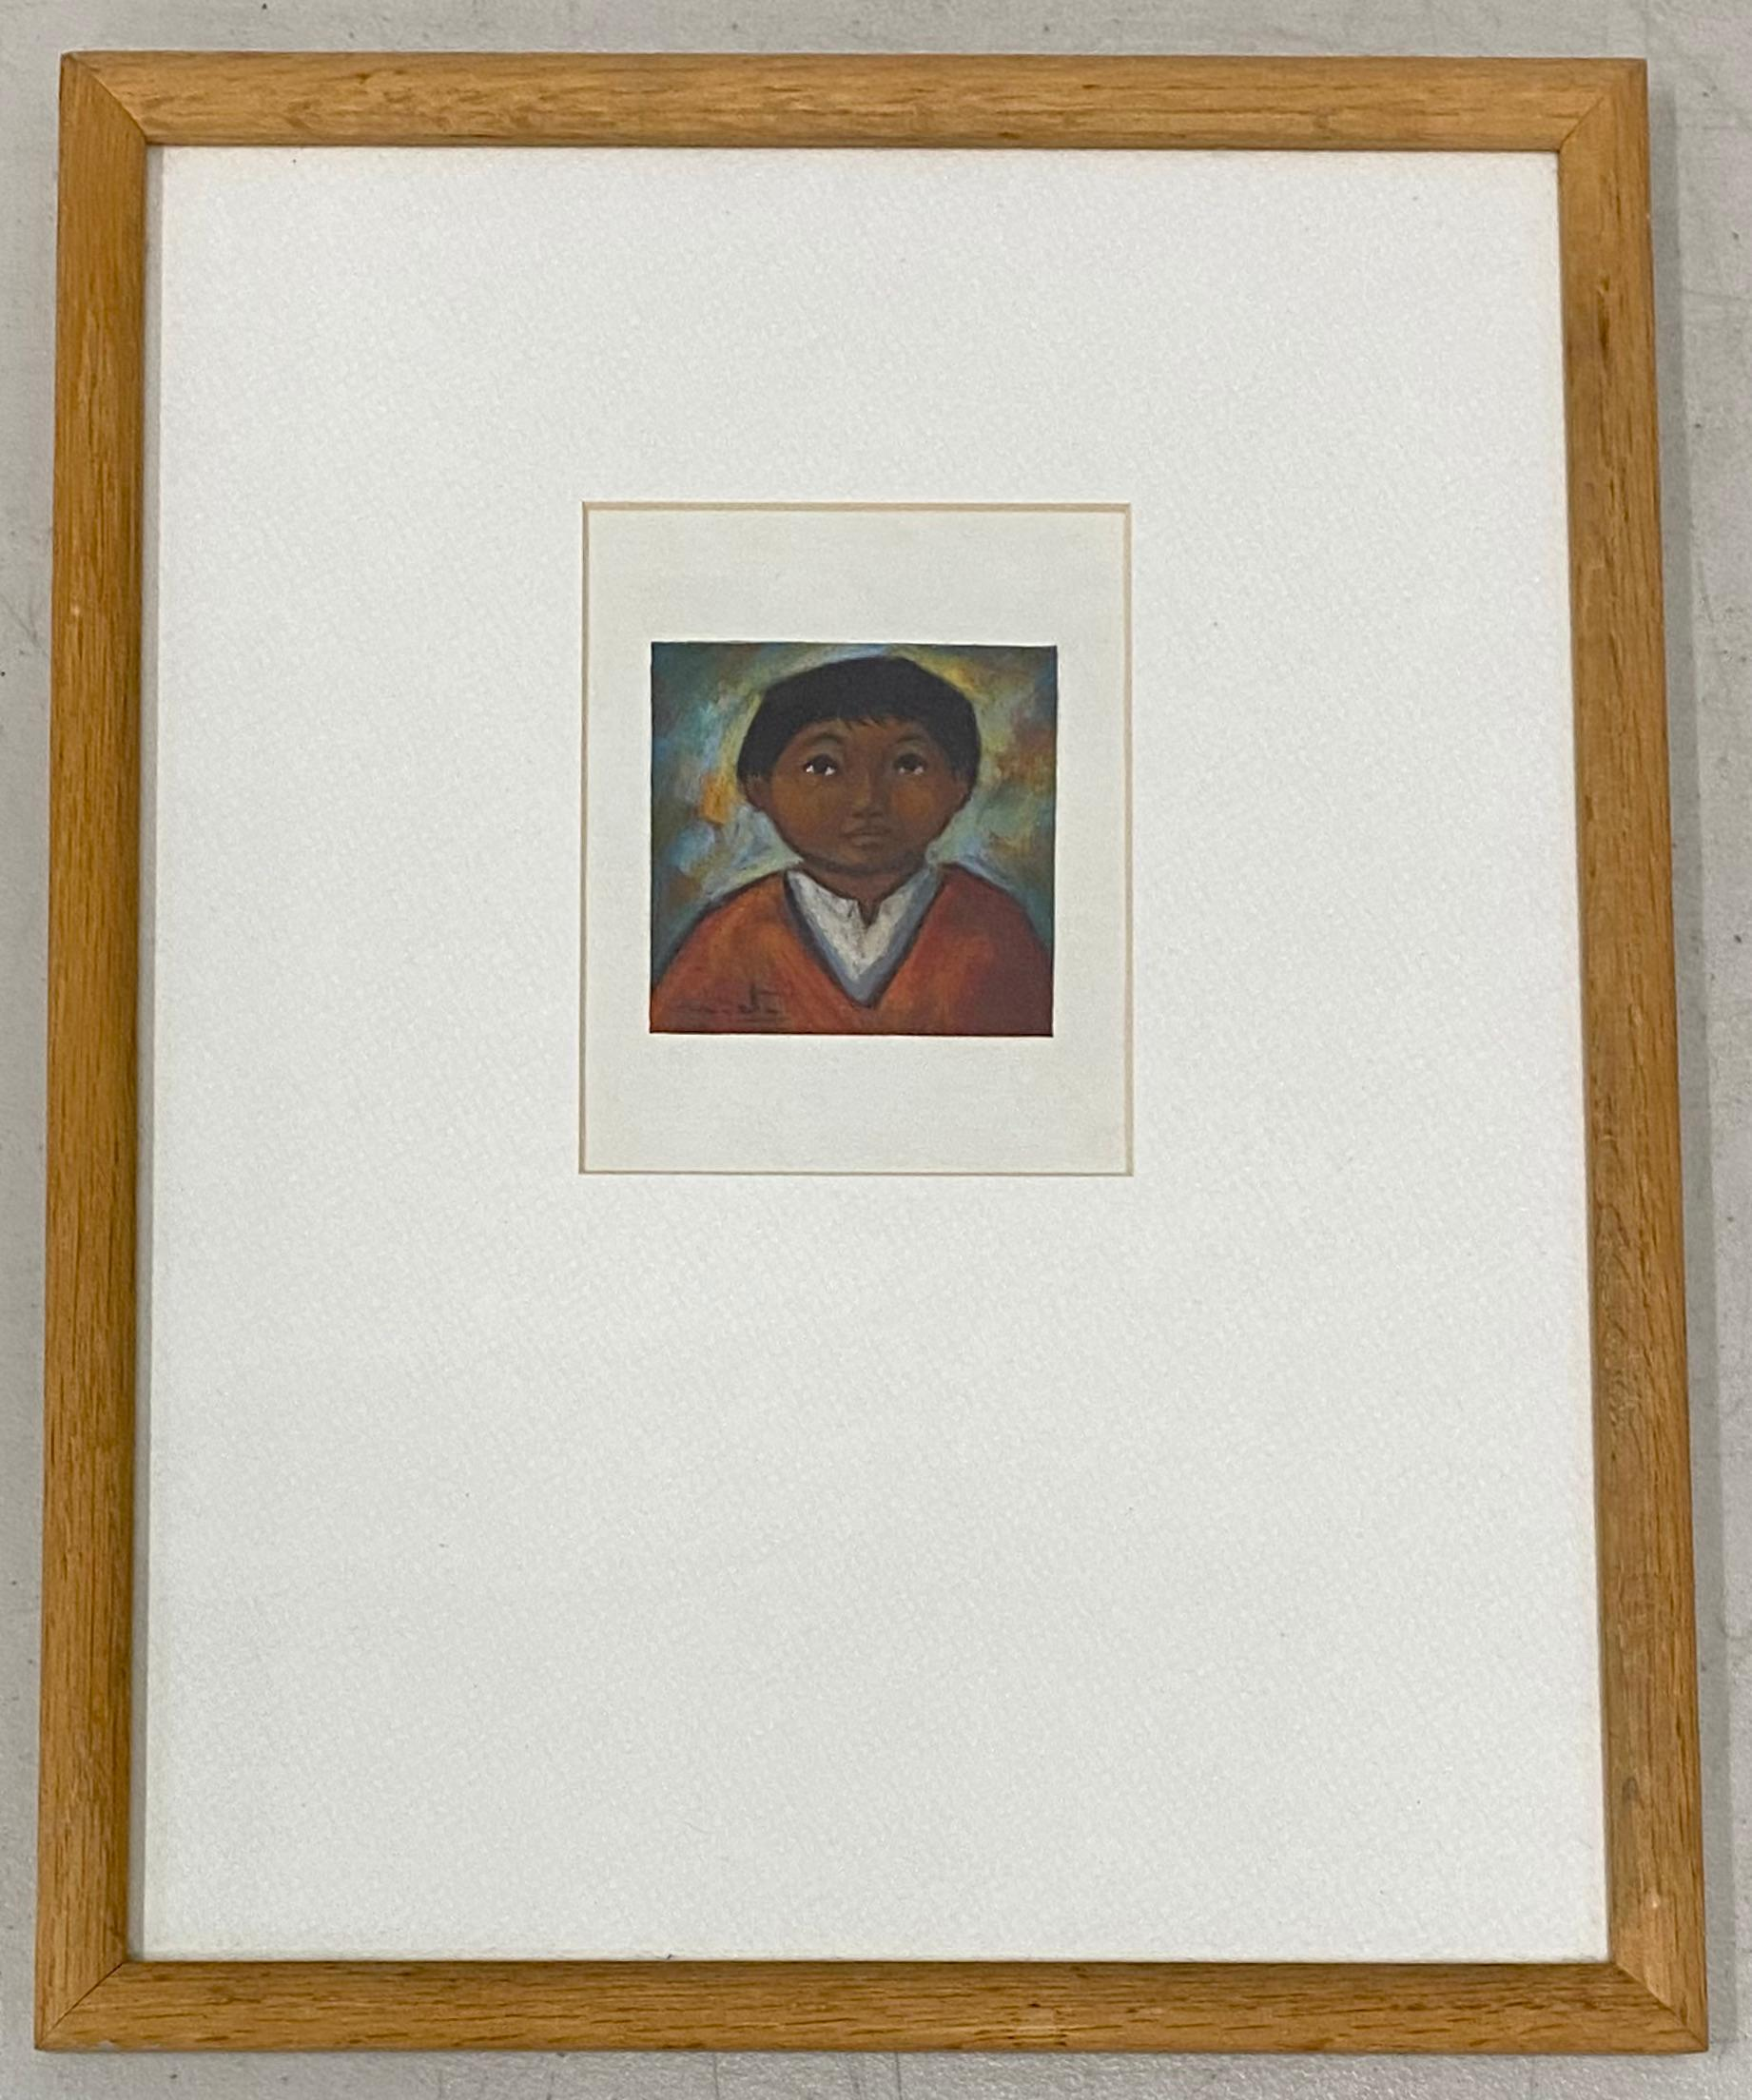 Arturo Nieto Pastel Portrait Miniature of a Young Boy c.1970